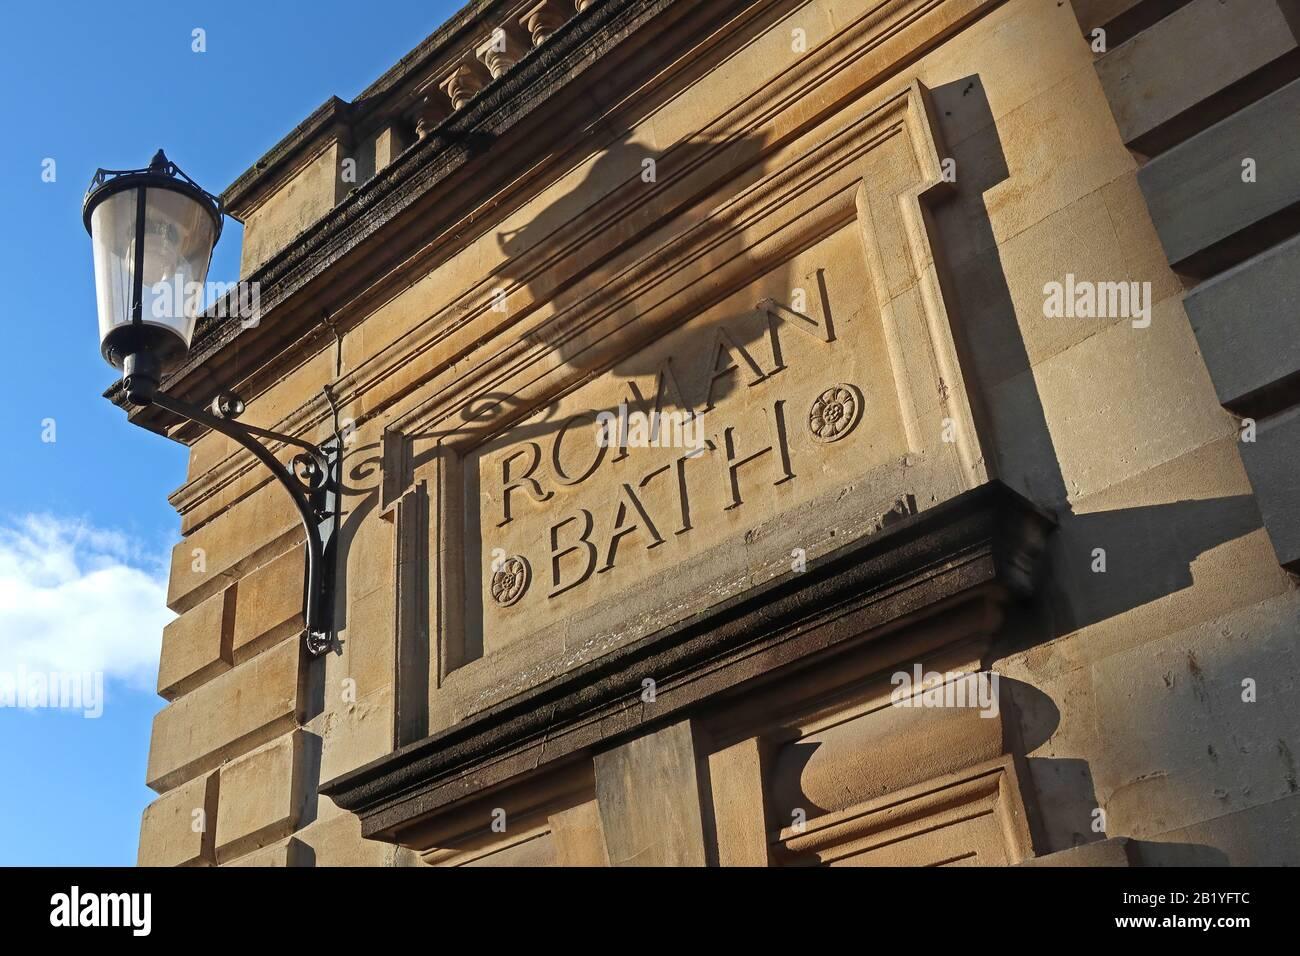 HotpixUK,@HotpixUK,GoTonySmith,UK,England,Bath England,bath spa,spa,Building,listed building,Roman baths,baths,city,city centre,Bath city,Roman Britain,what did the Romans do for us,temple,Sacred Spring,Roman Temple,stone,sign,stone sign